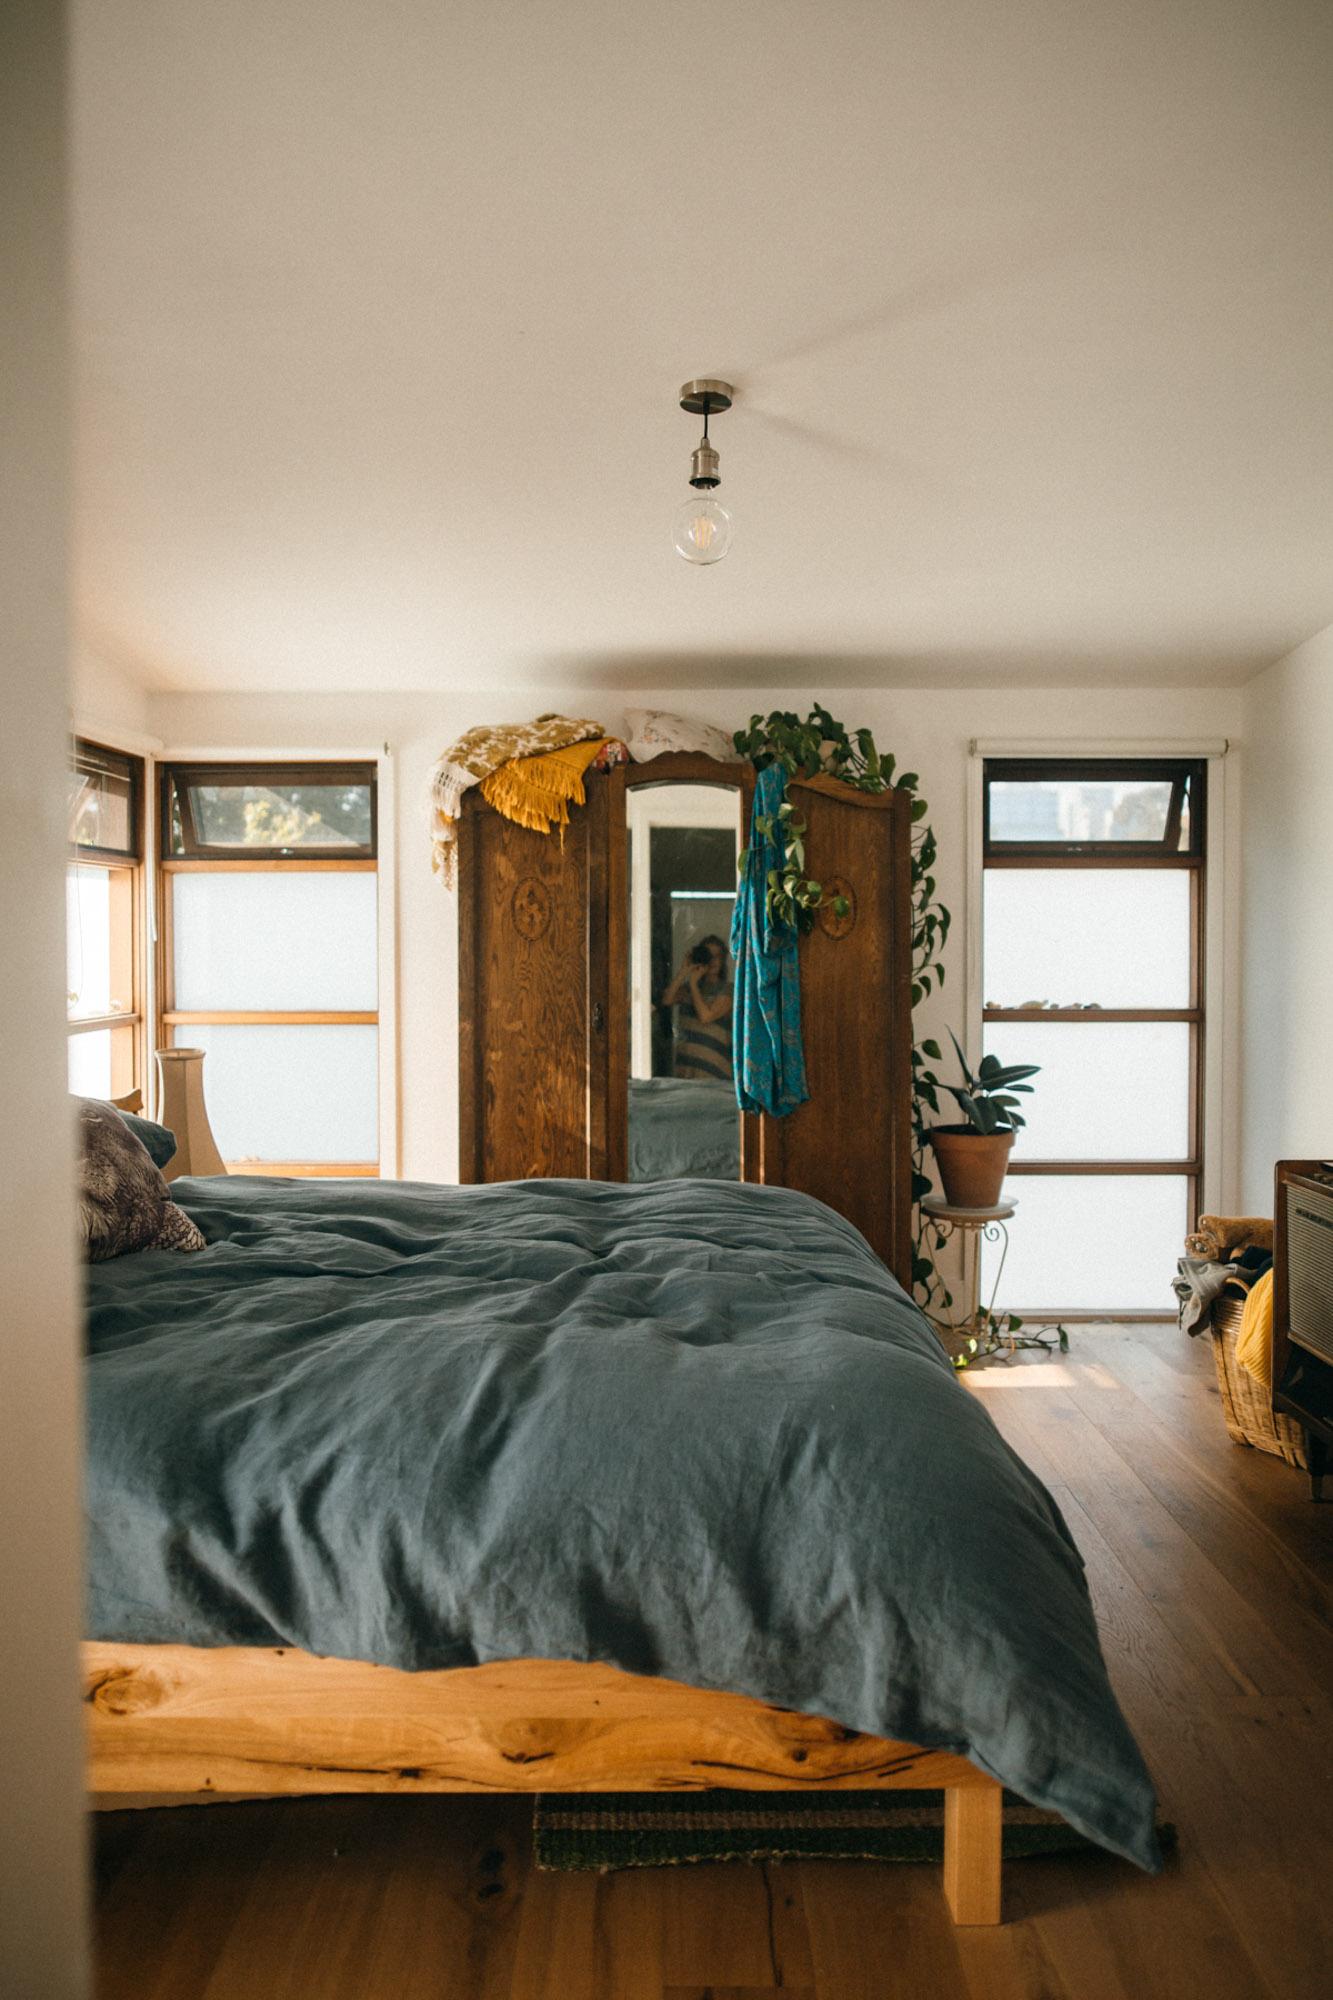 Feature Headboard Square Bed    -    Mr Draper    bed linen.